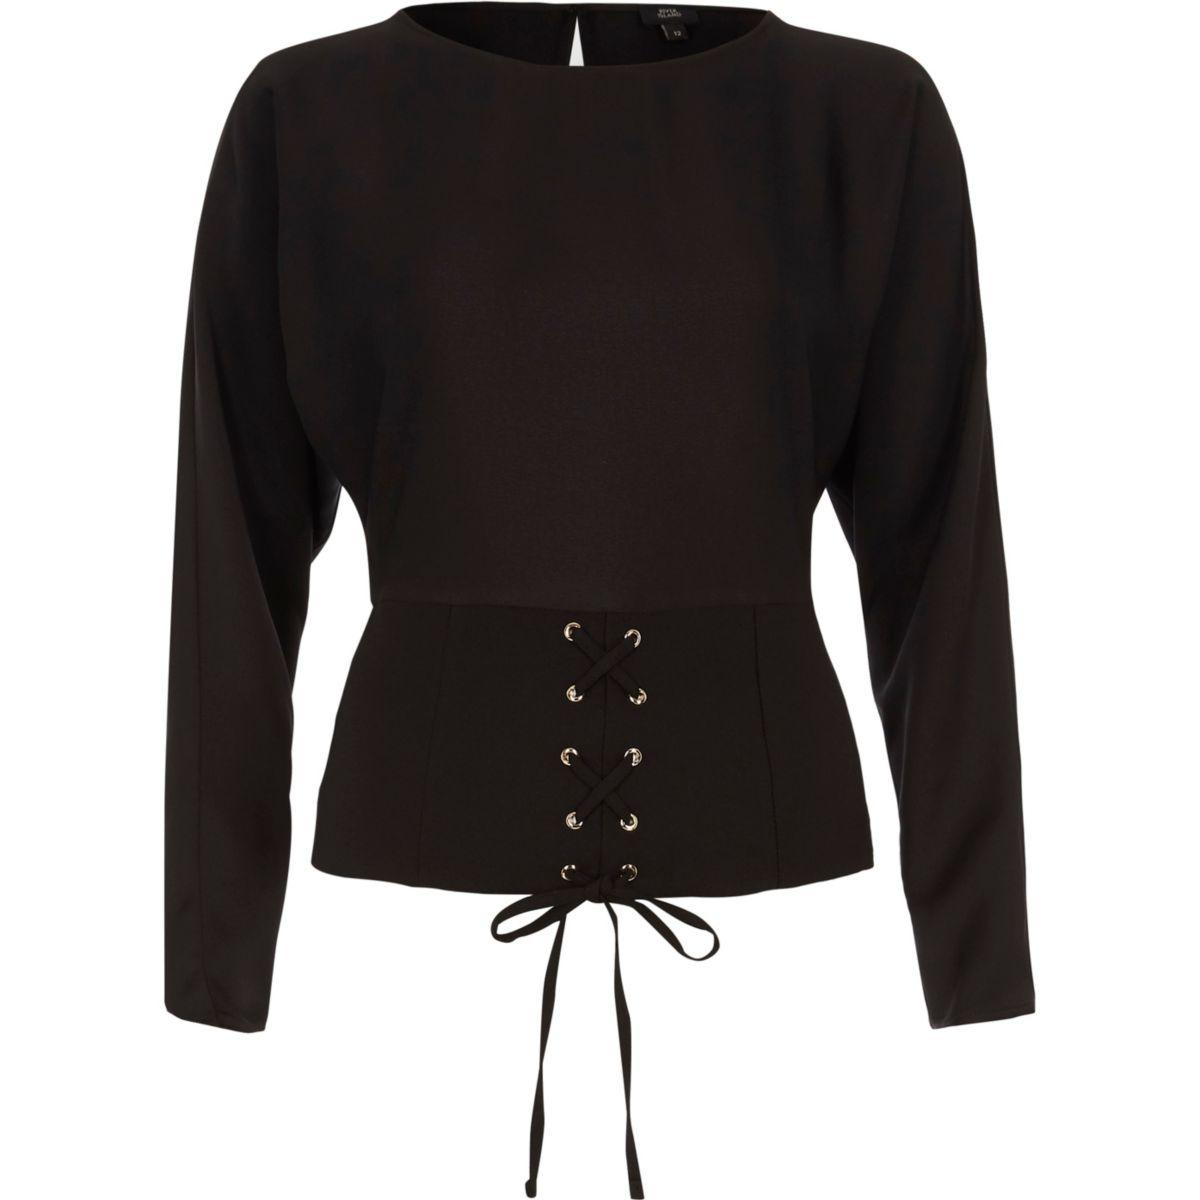 Black corset front long sleeve top